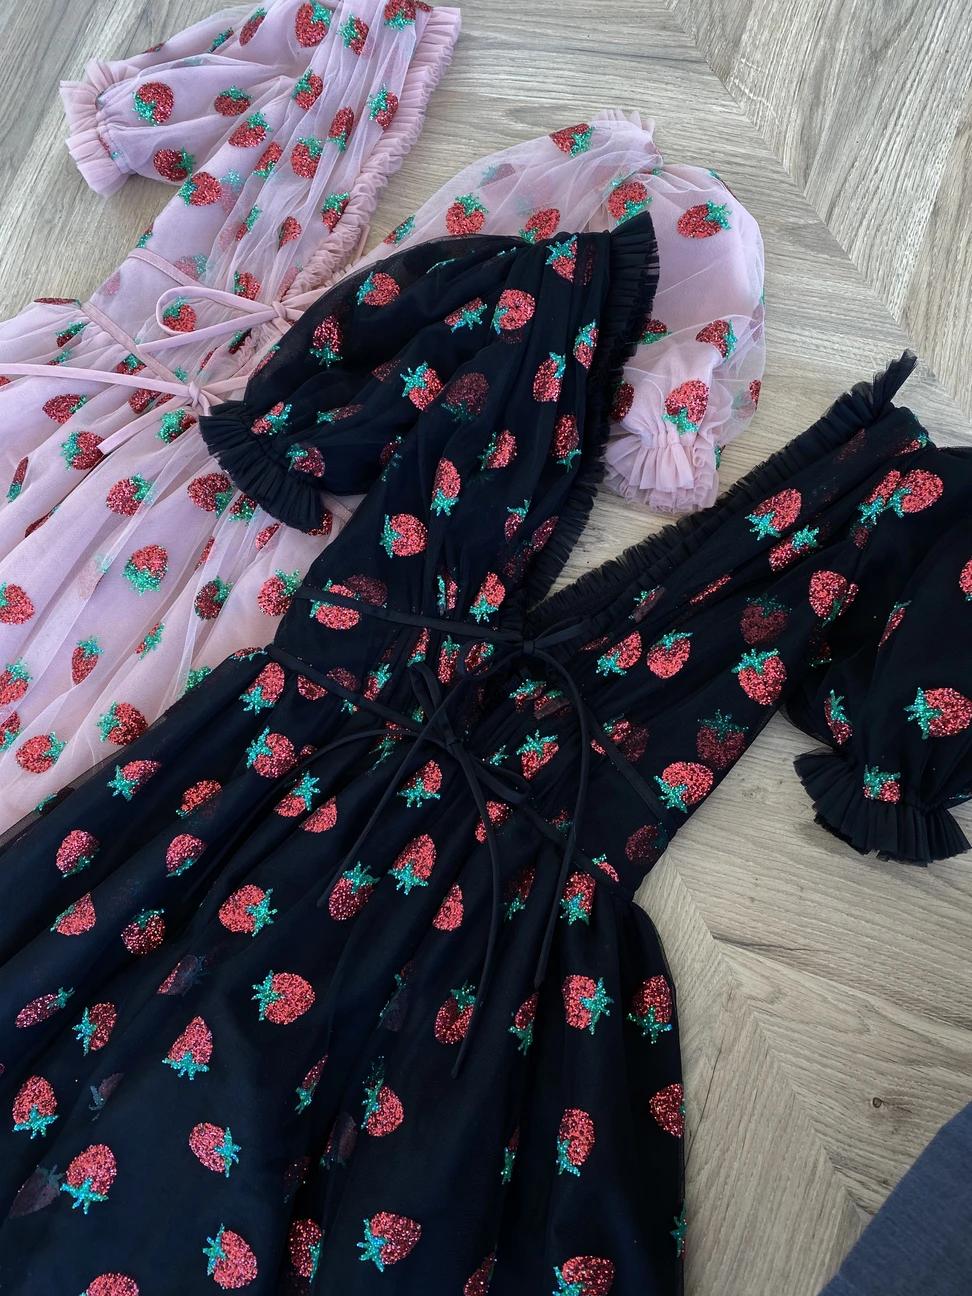 Strawberry Midi Dress Black Pretty Dresses Strawberry Dress Black Midi Dress [ 1296 x 972 Pixel ]